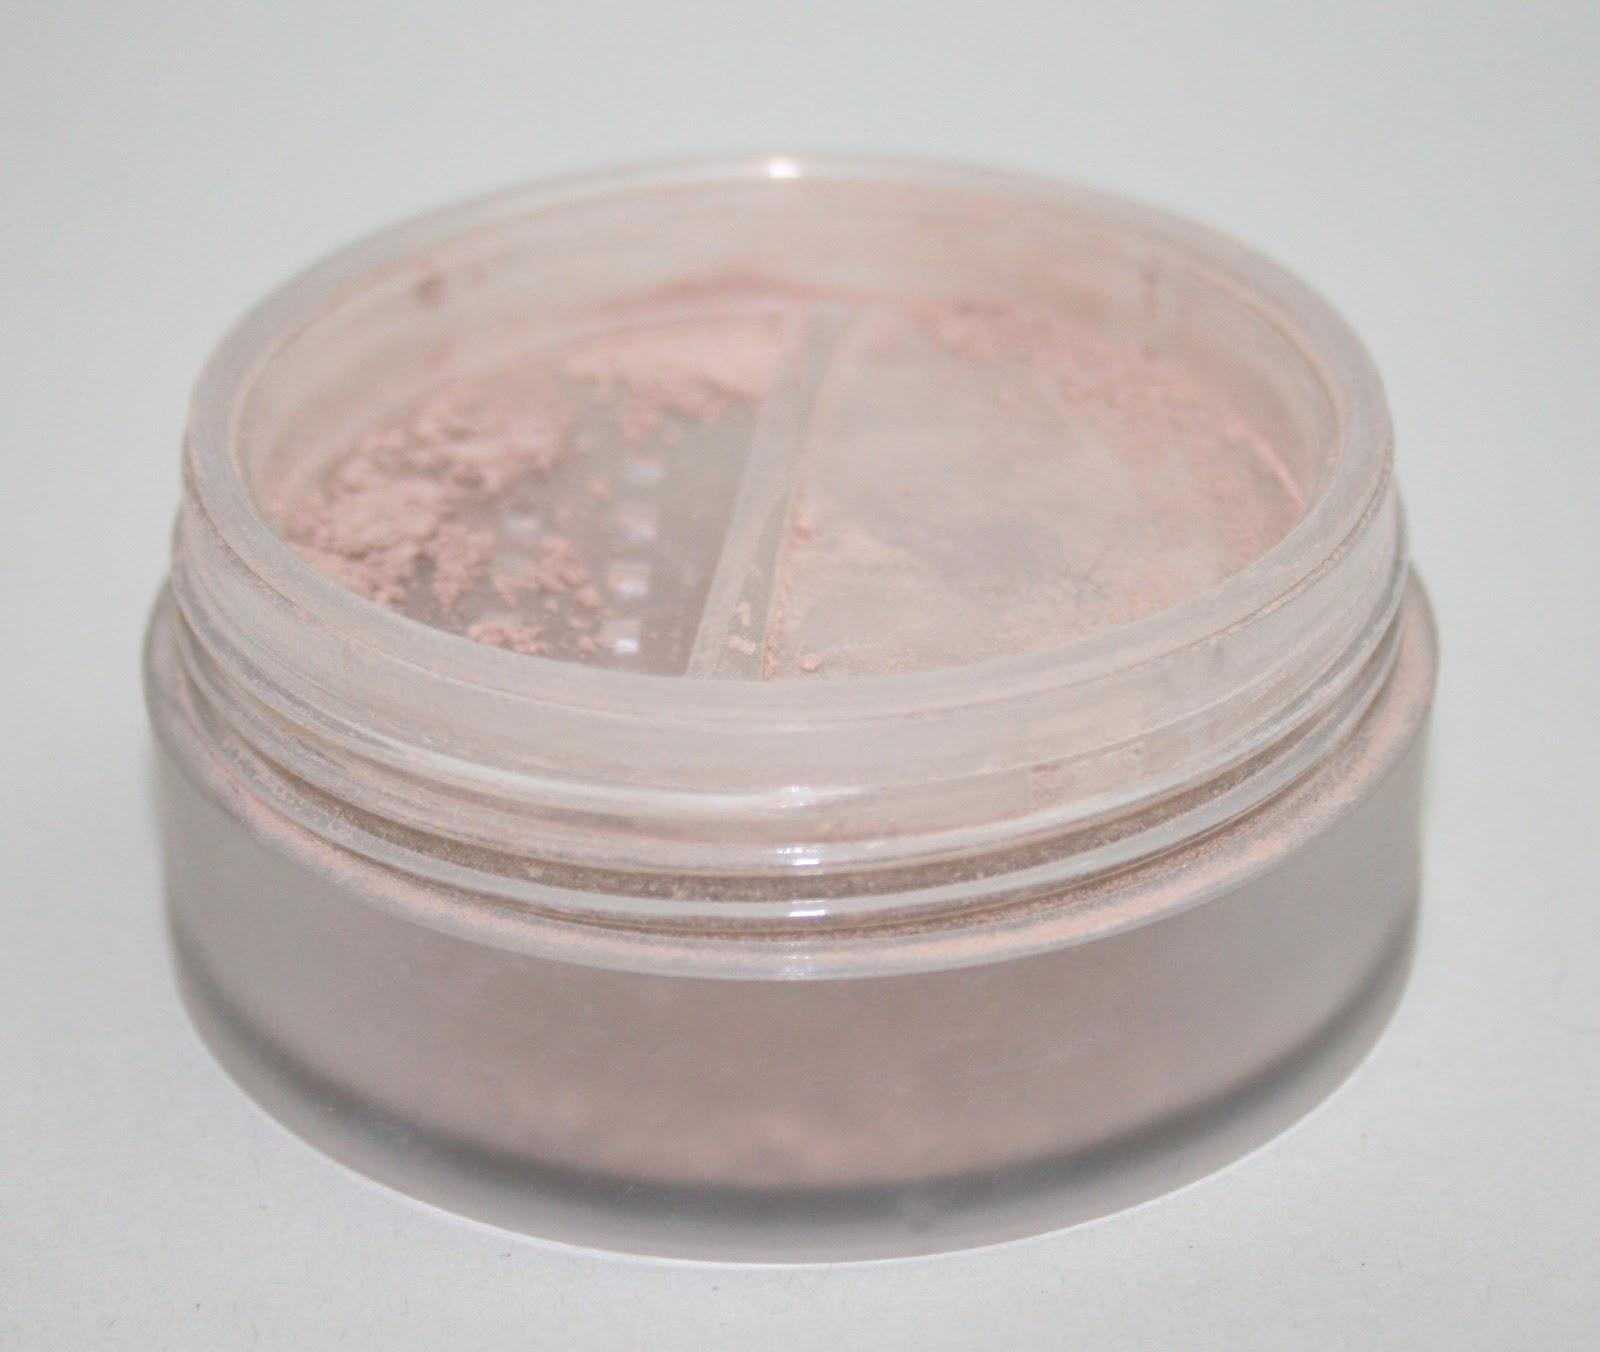 Laura Mercier Candleglow Powder Swatches: Laura Mercier Mineral Powder SPF15 In Natural Beige And